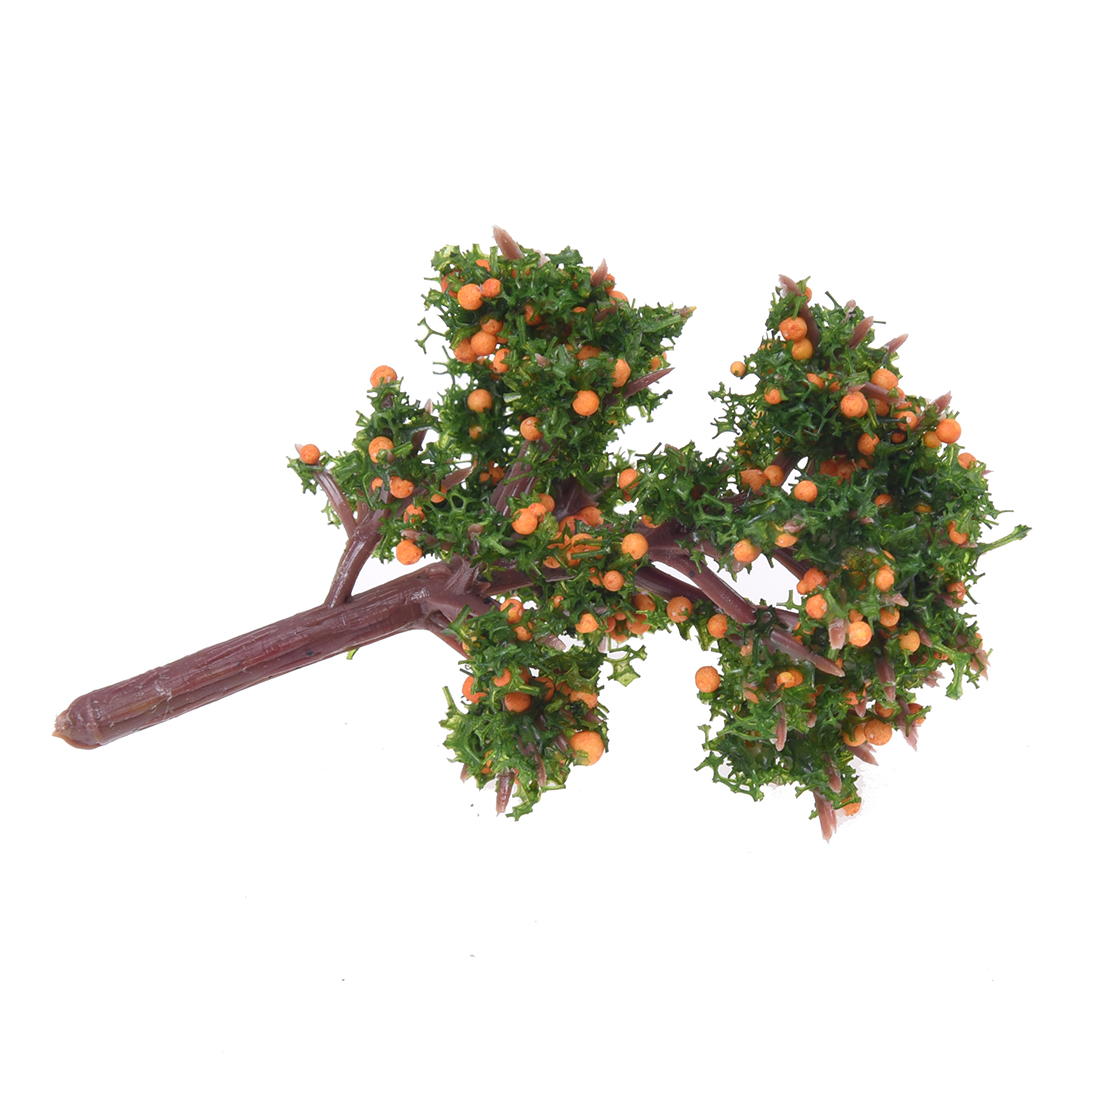 Miniature Emulation Orange Tree Moss Bonsai Micro Landscape DIY Craft Garden Ornament